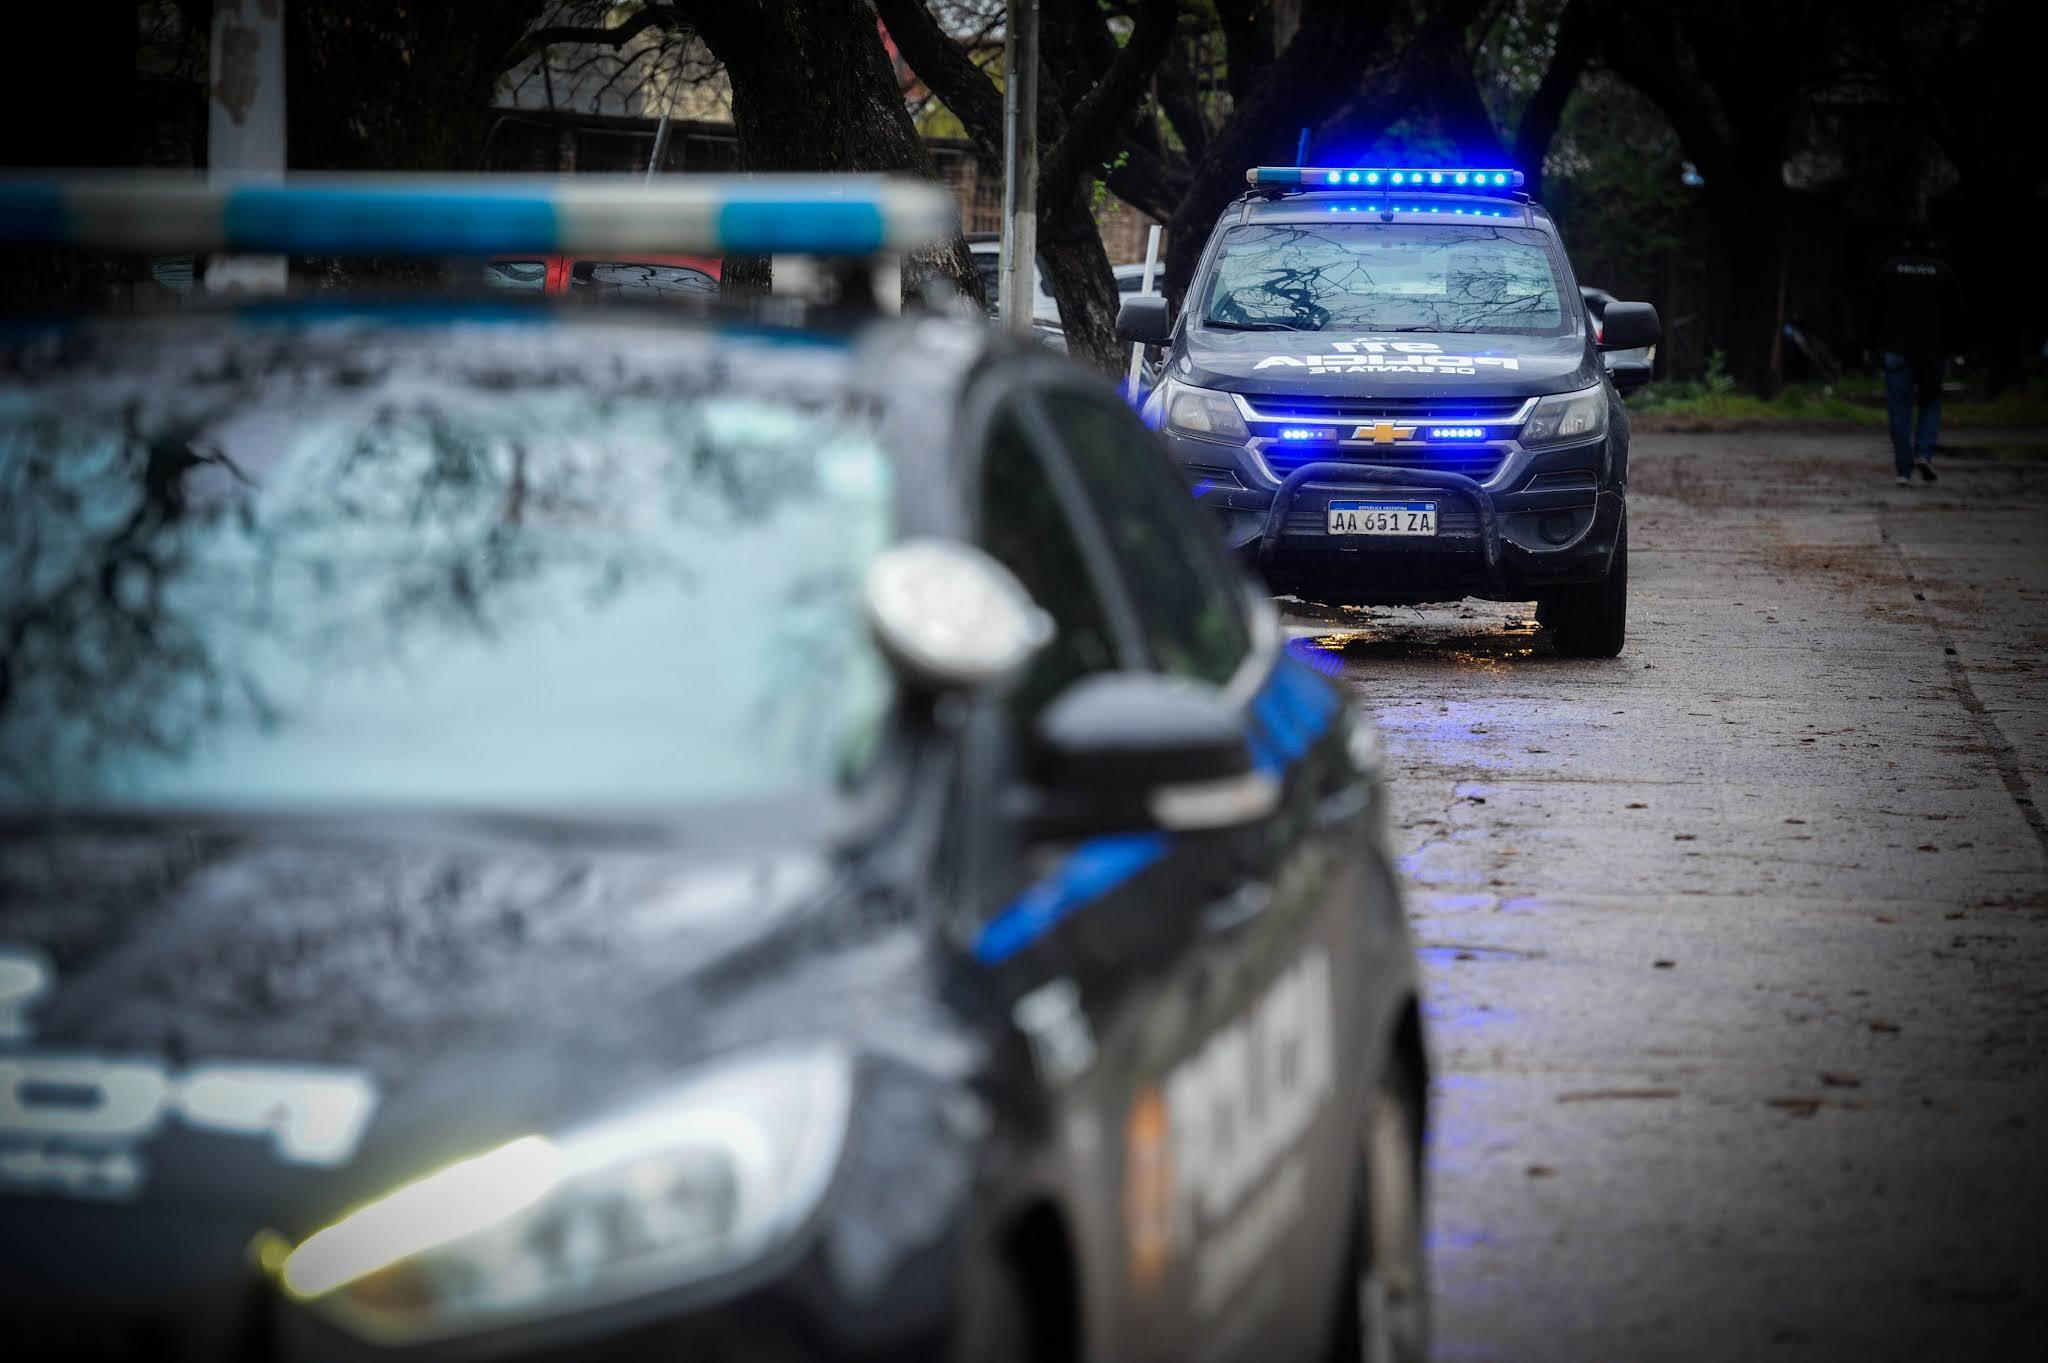 Violencia sin fin en Rosario: un joven fue asesinado a balazos en plena calle